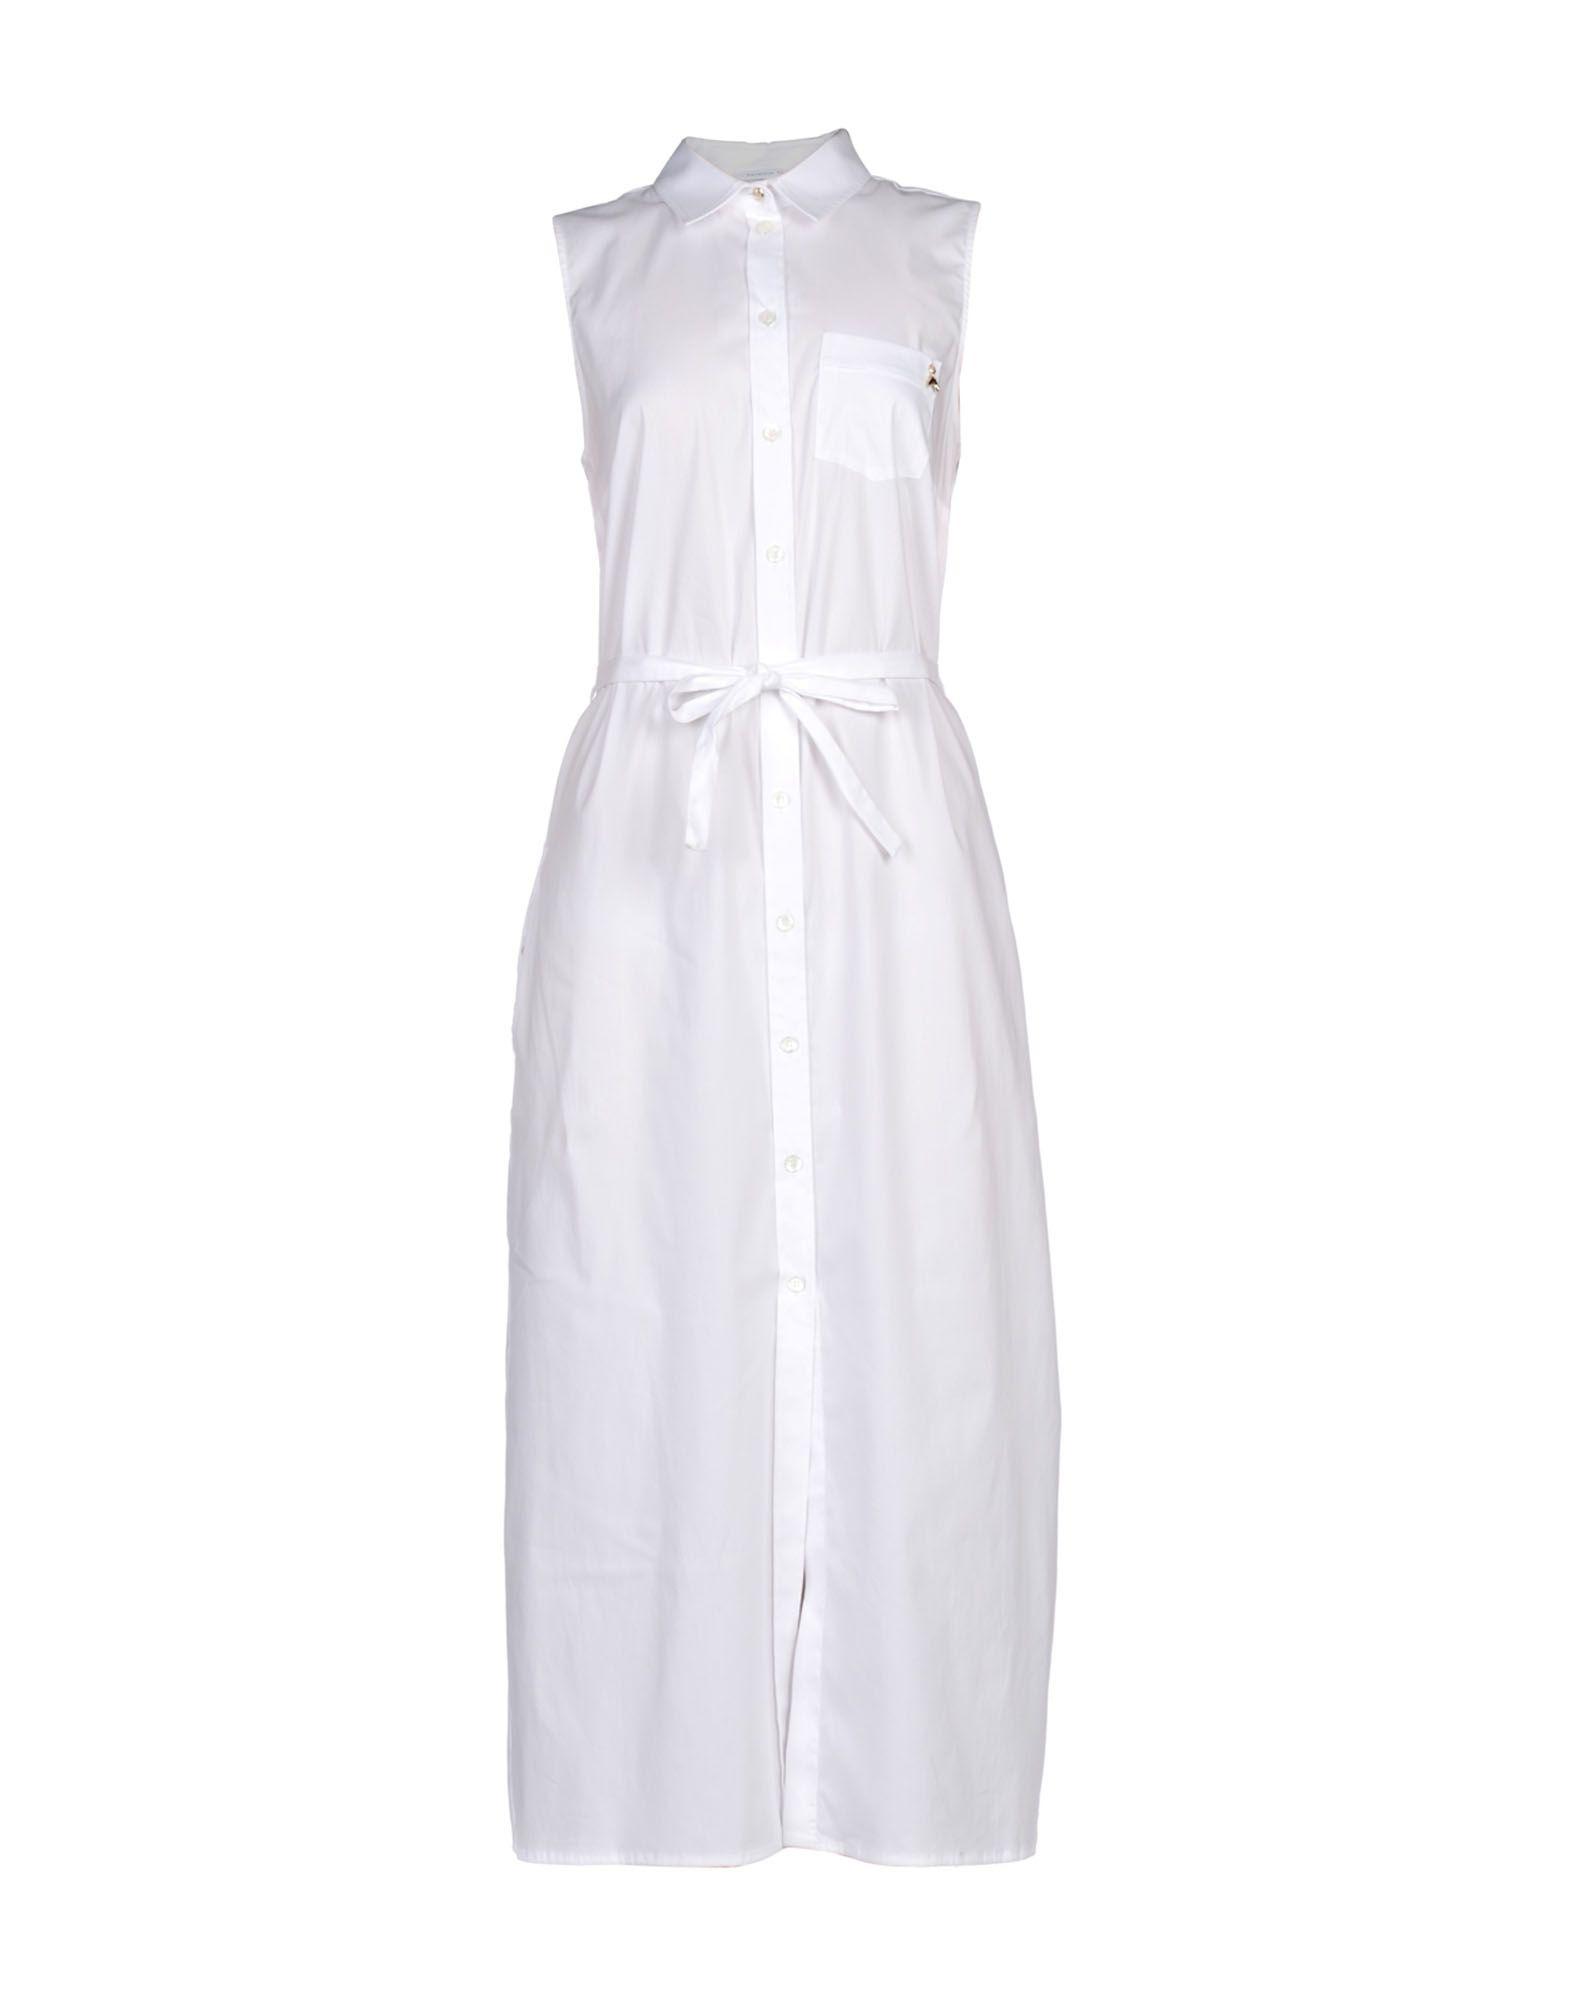 PATRIZIA PEPE - ROBES - Robes mi-longues